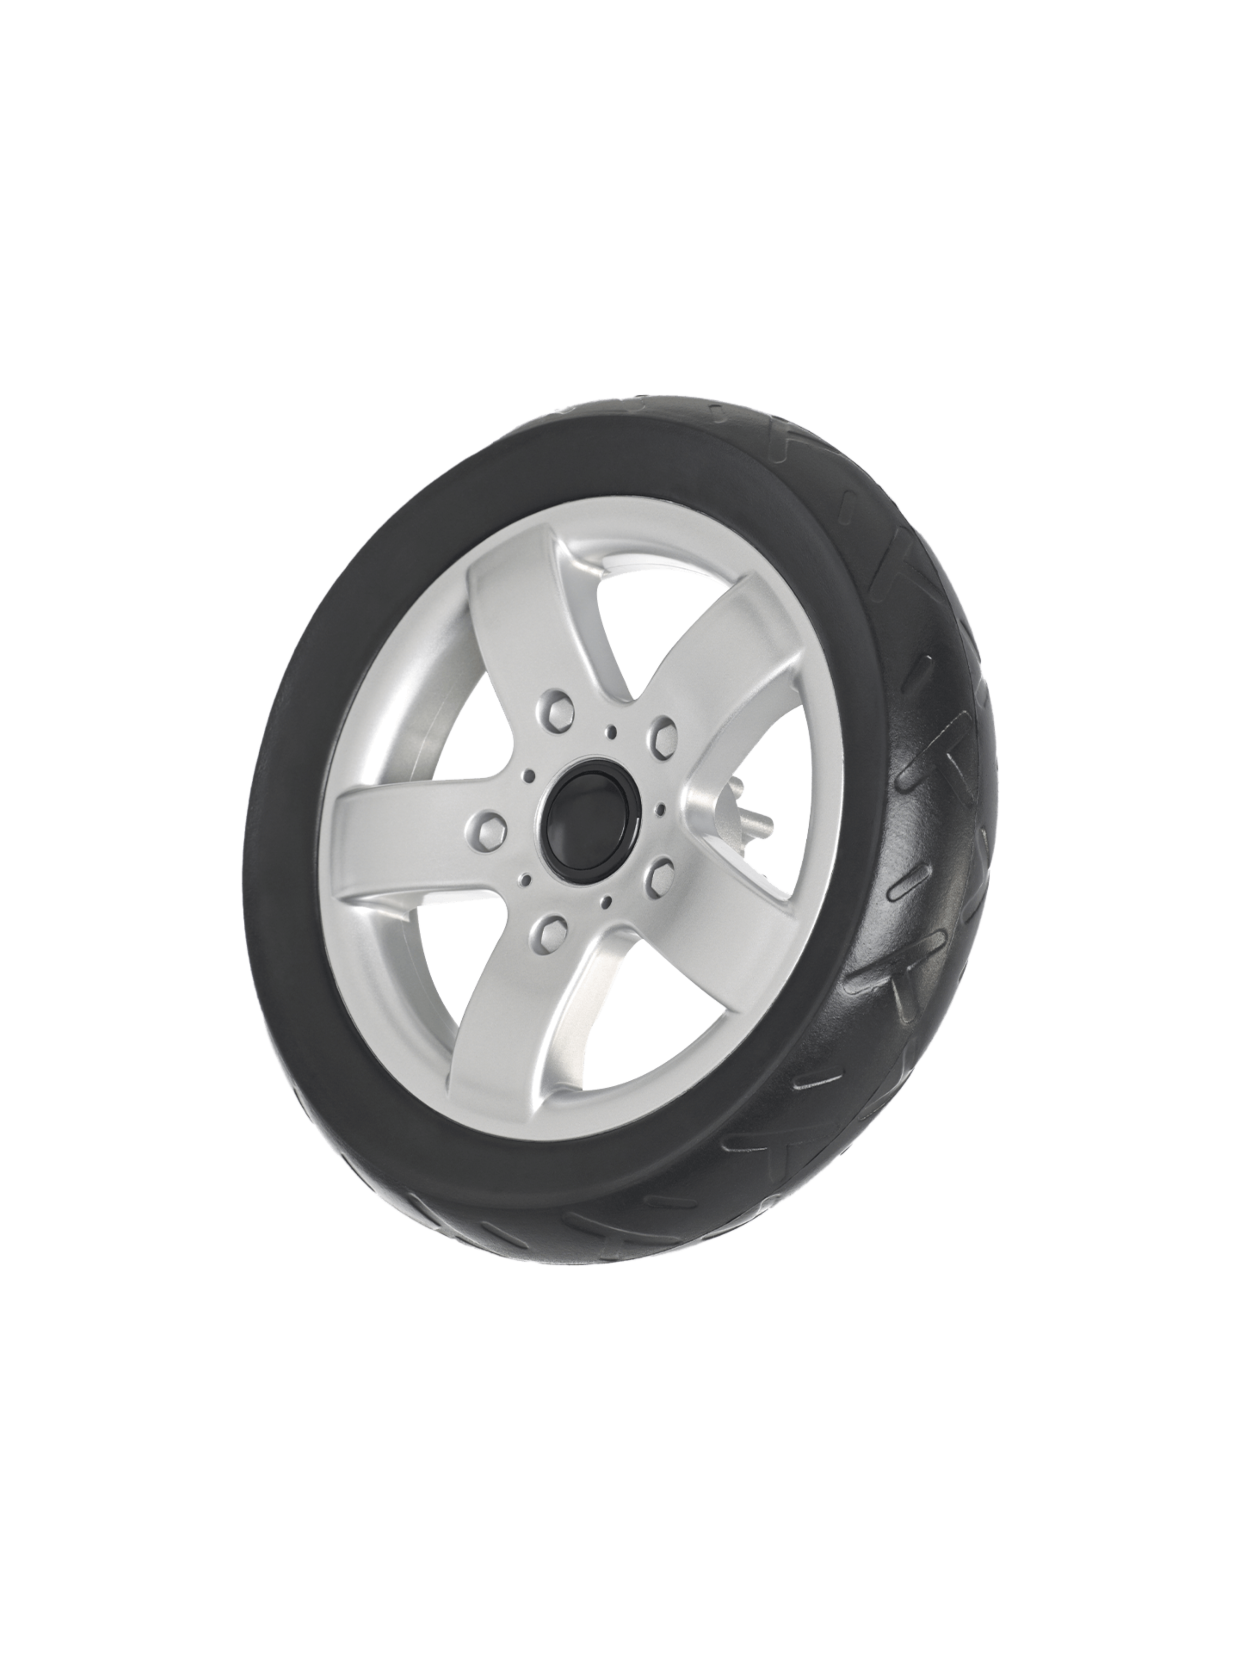 Cherry Rear Wheel & Axle